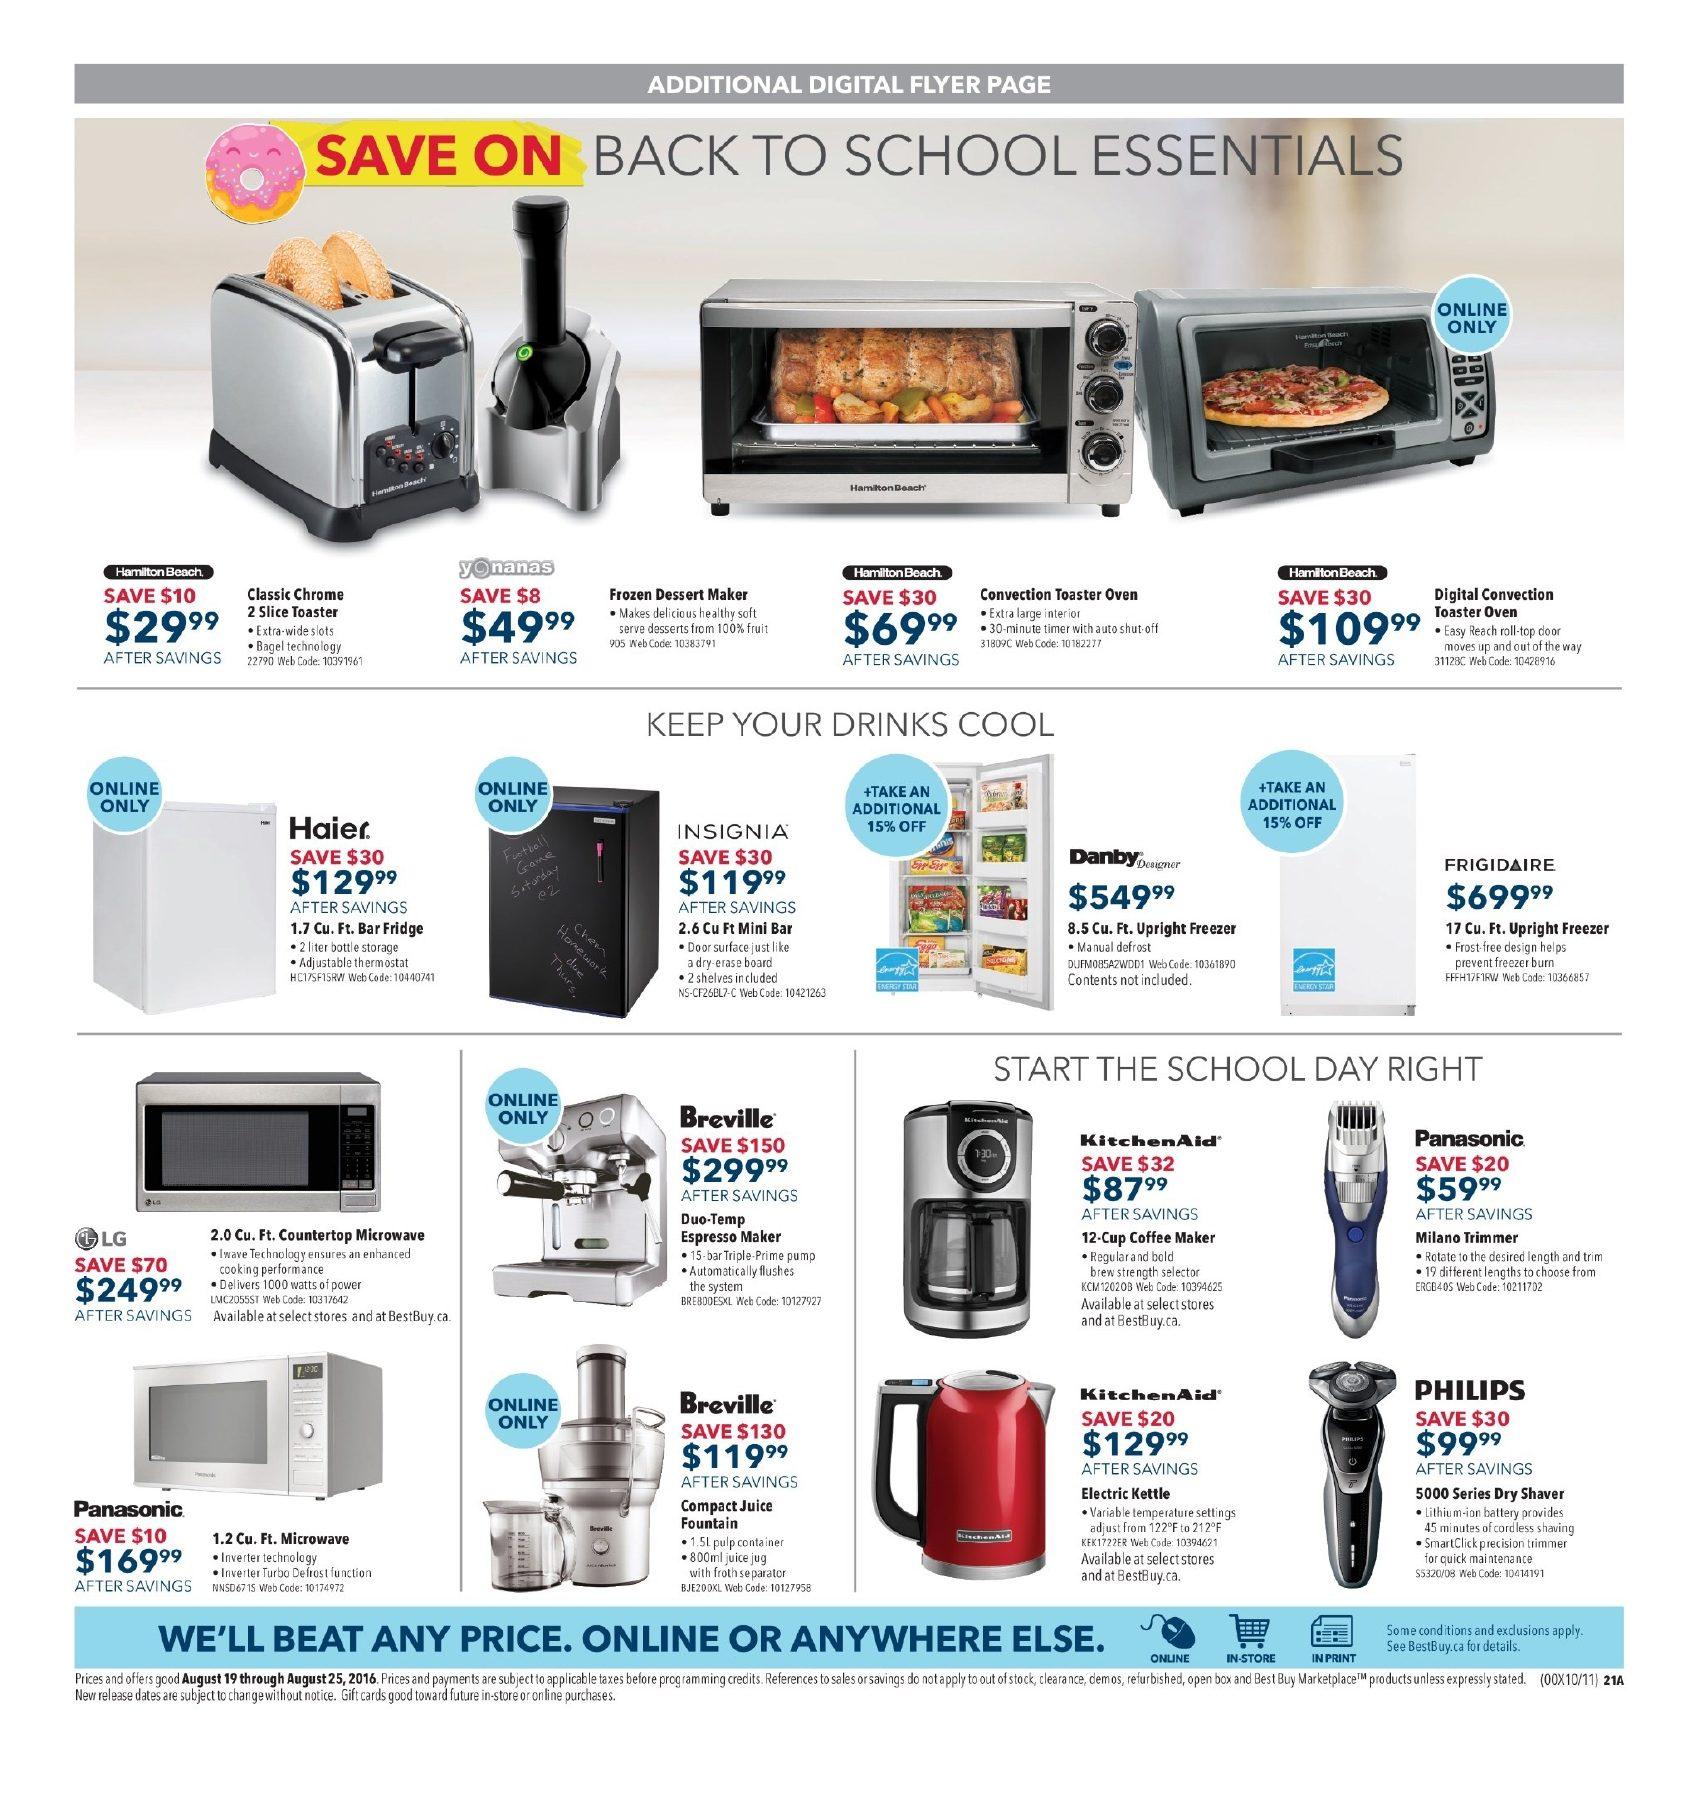 Best buy weekly flyer weekly hp days sale event aug 19 25 best buy weekly flyer weekly hp days sale event aug 19 25 redflagdeals fandeluxe Images